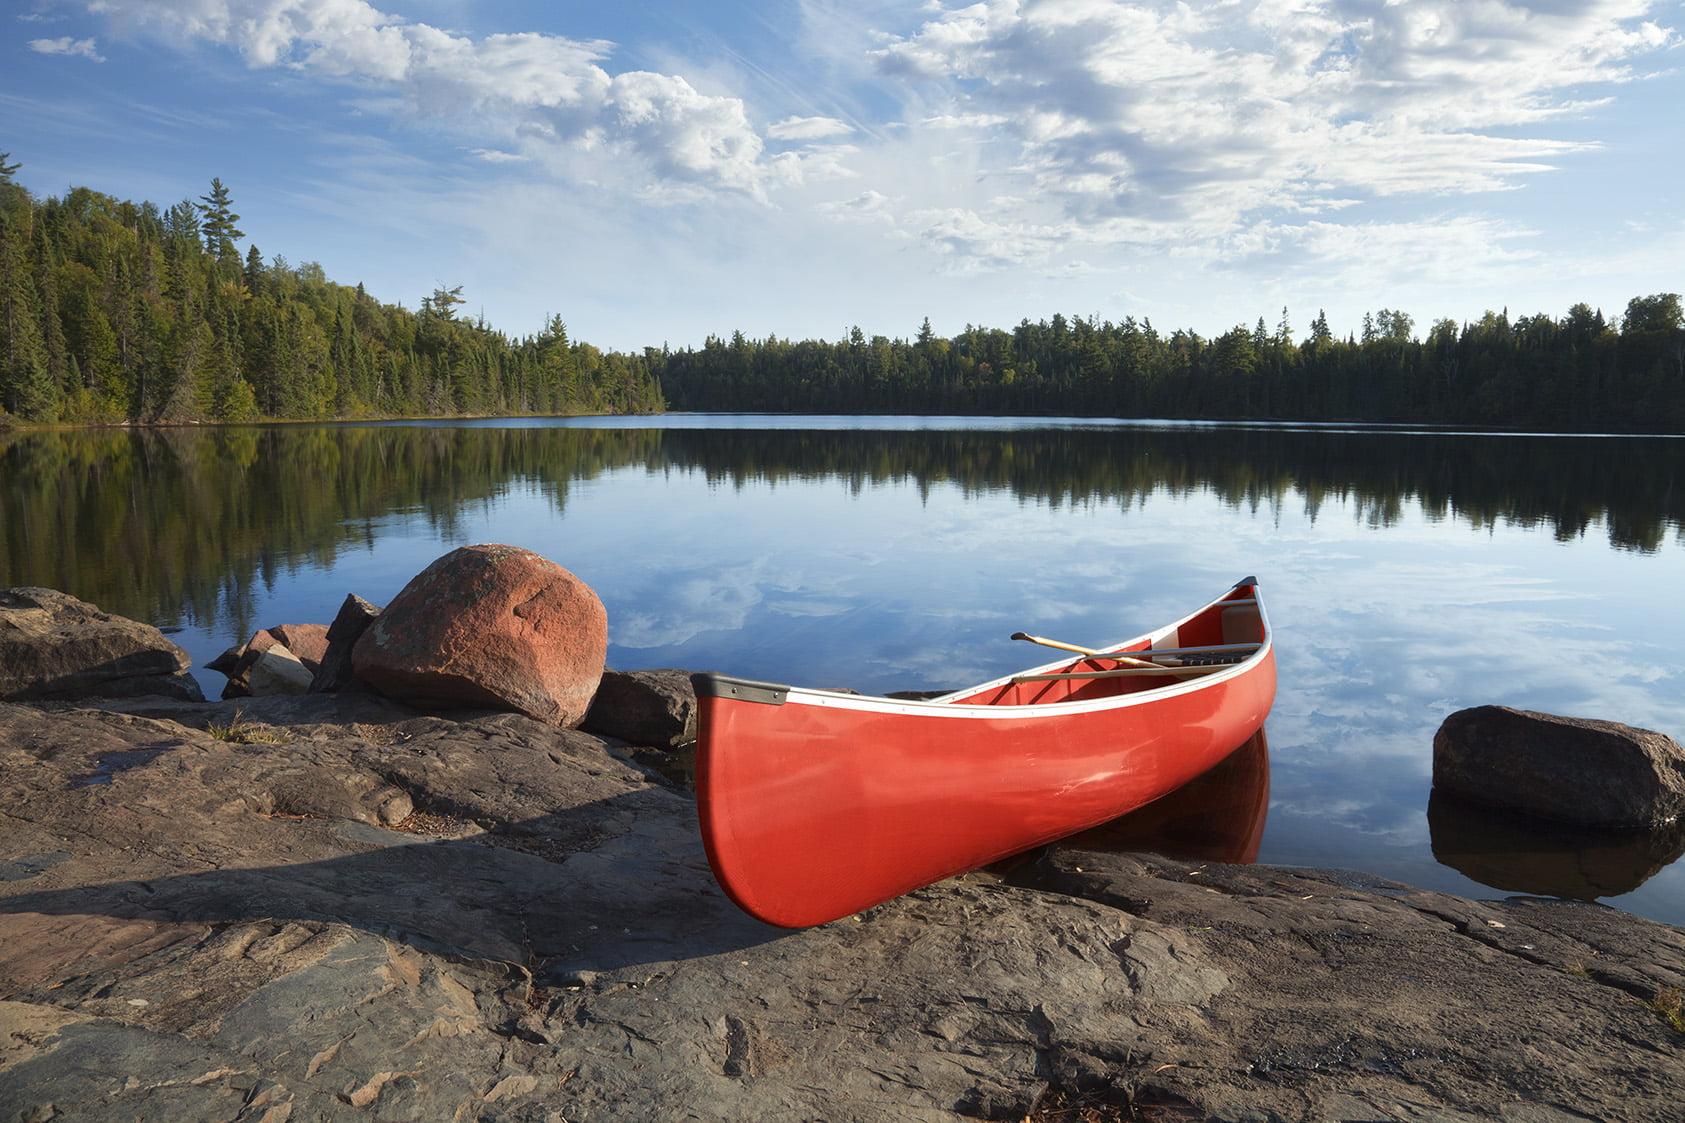 Canoe on Boundary Waters of Minnesota